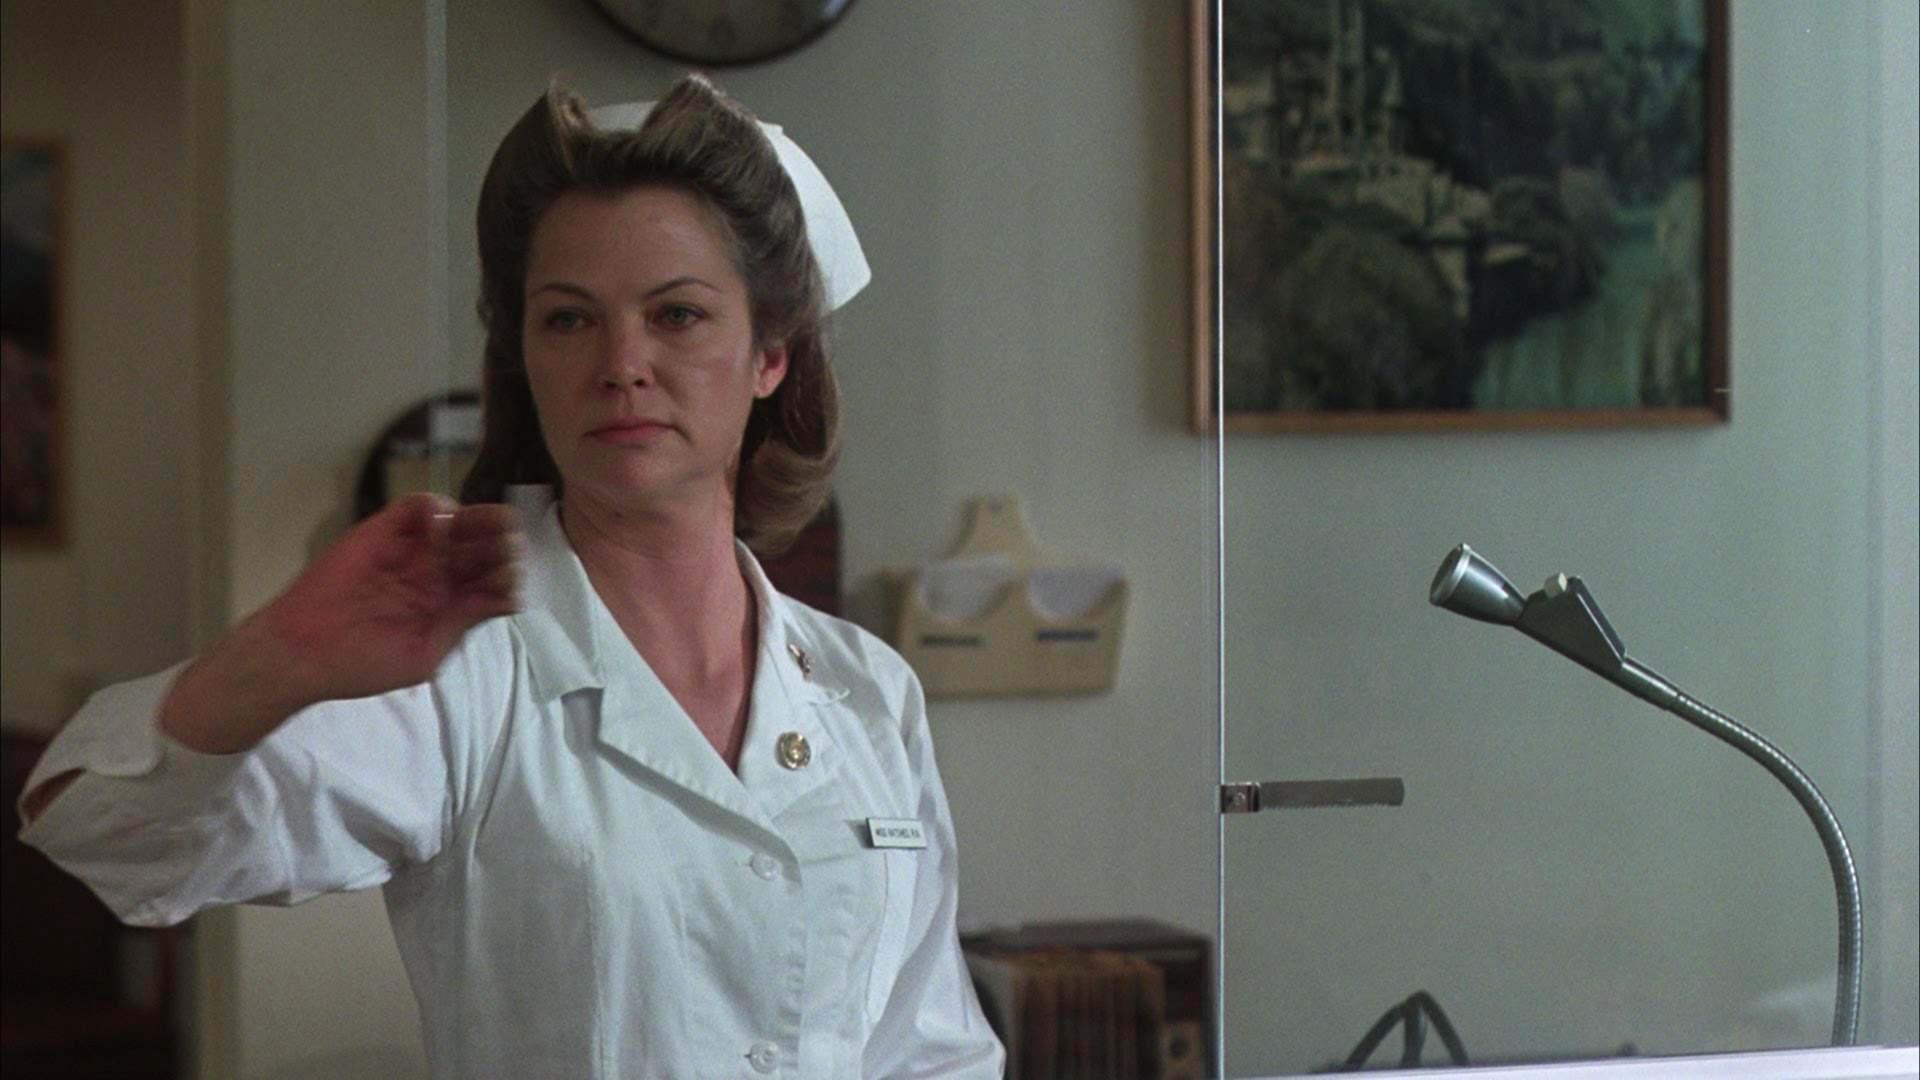 Кадры из фильма Пролетая над гнездом кукушки One Flew Over the Cuckoo's Nest 1975